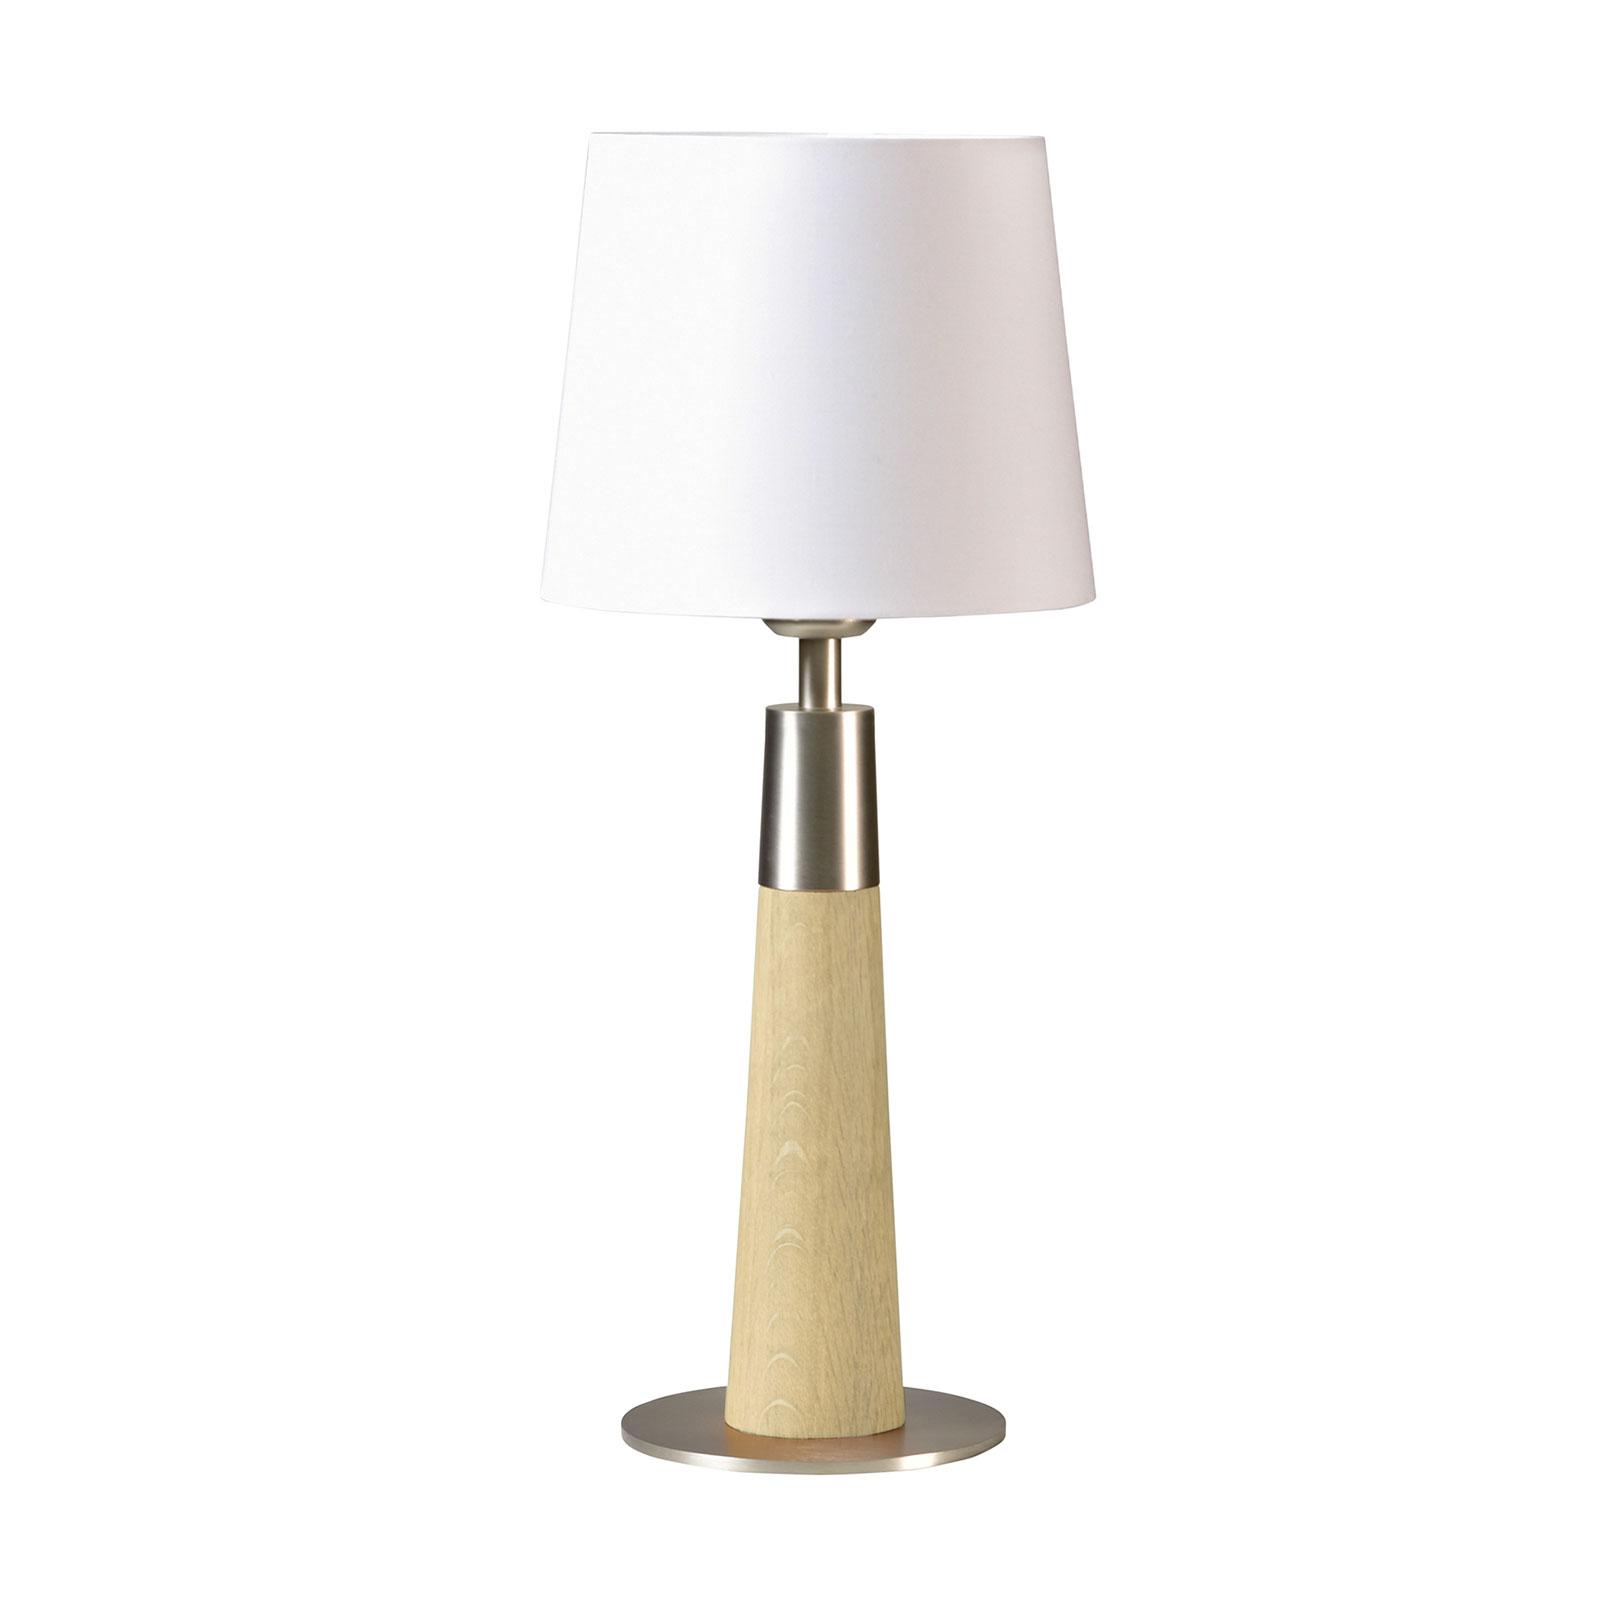 HerzBlut Conico tafellamp wit, eiken natuur, 44cm